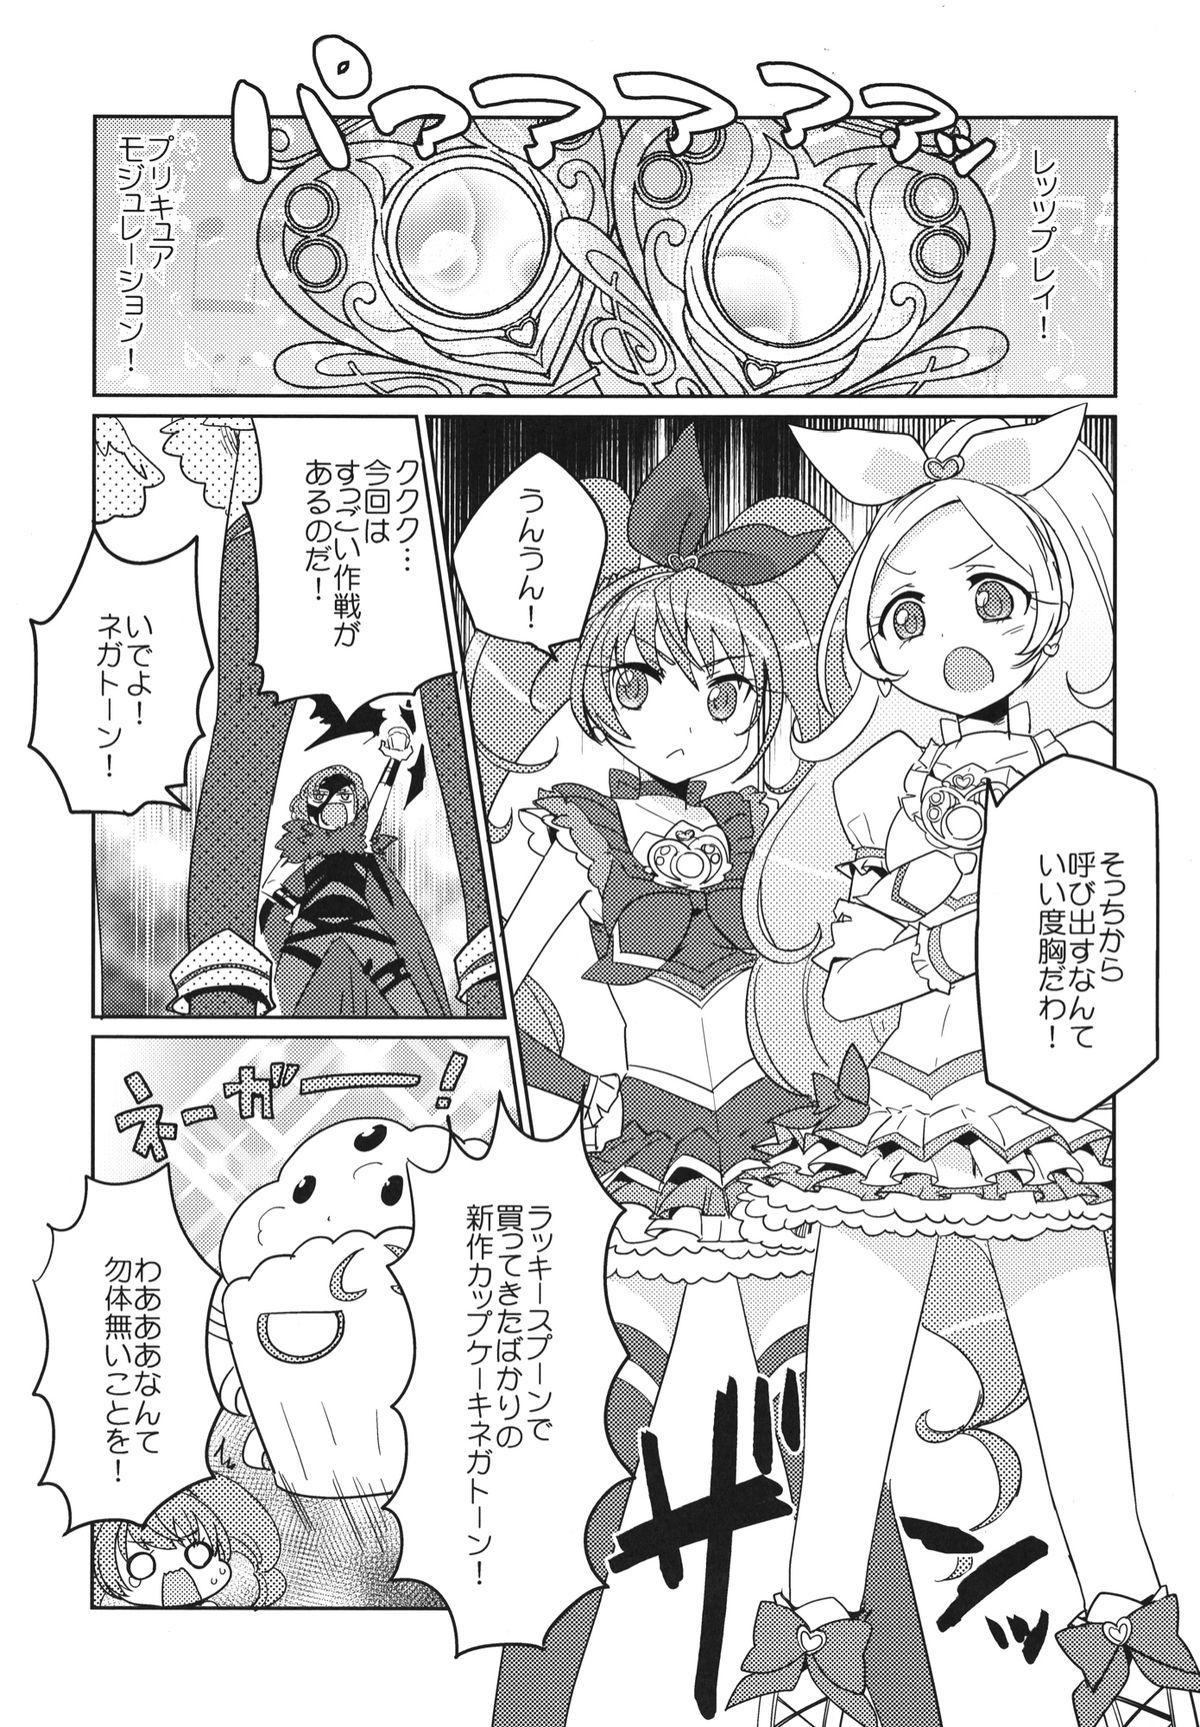 Sanbyoushi! 3